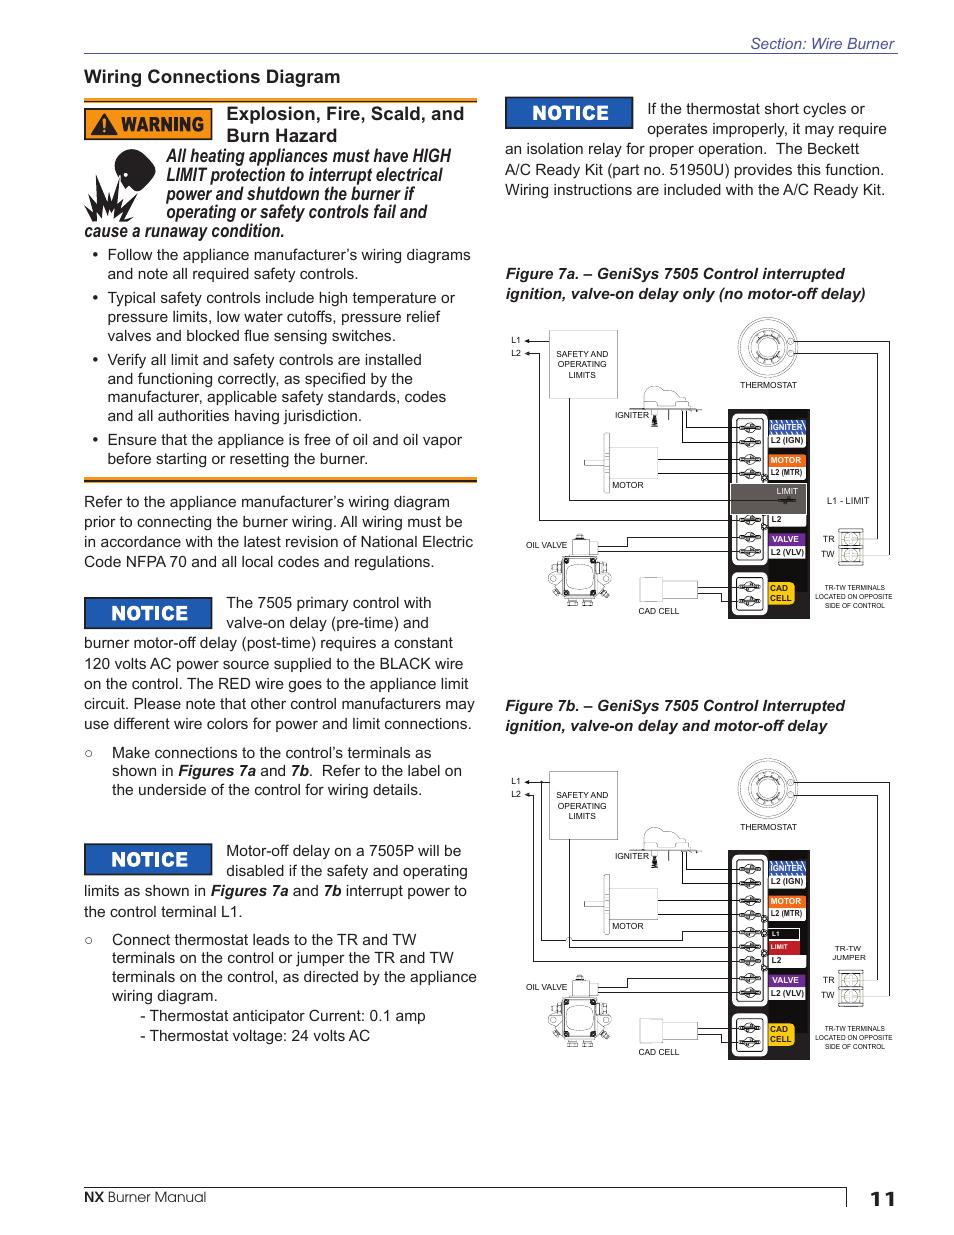 Wiring Connections Diagram  Nx Burner Manual